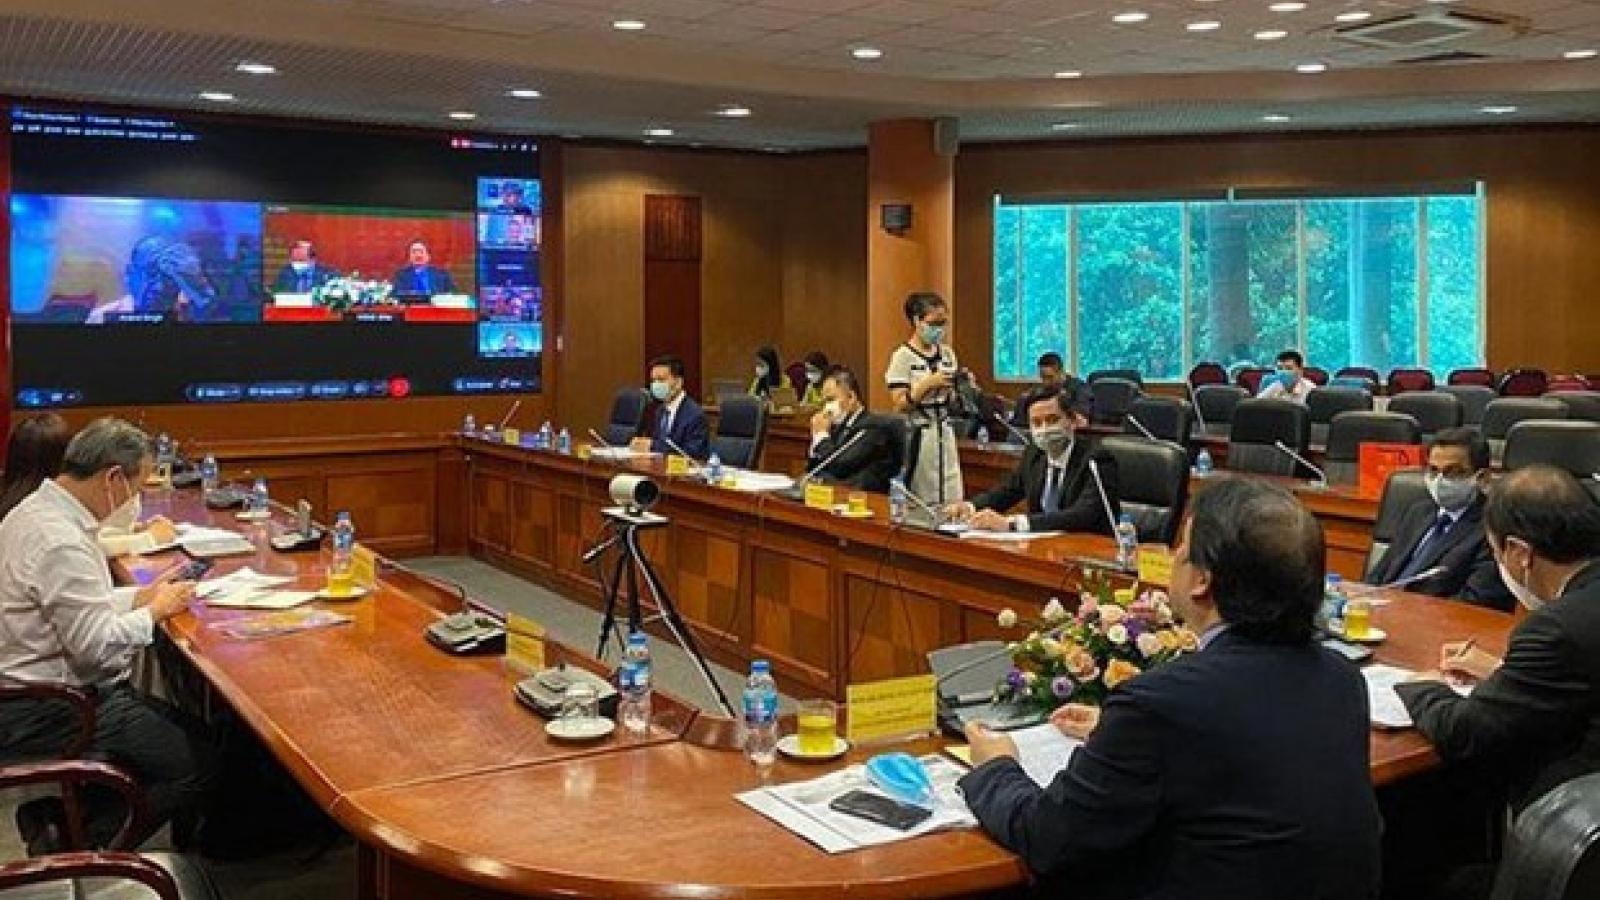 Int'l seminar spotlights India - ASEAN culture - civilization connectivity